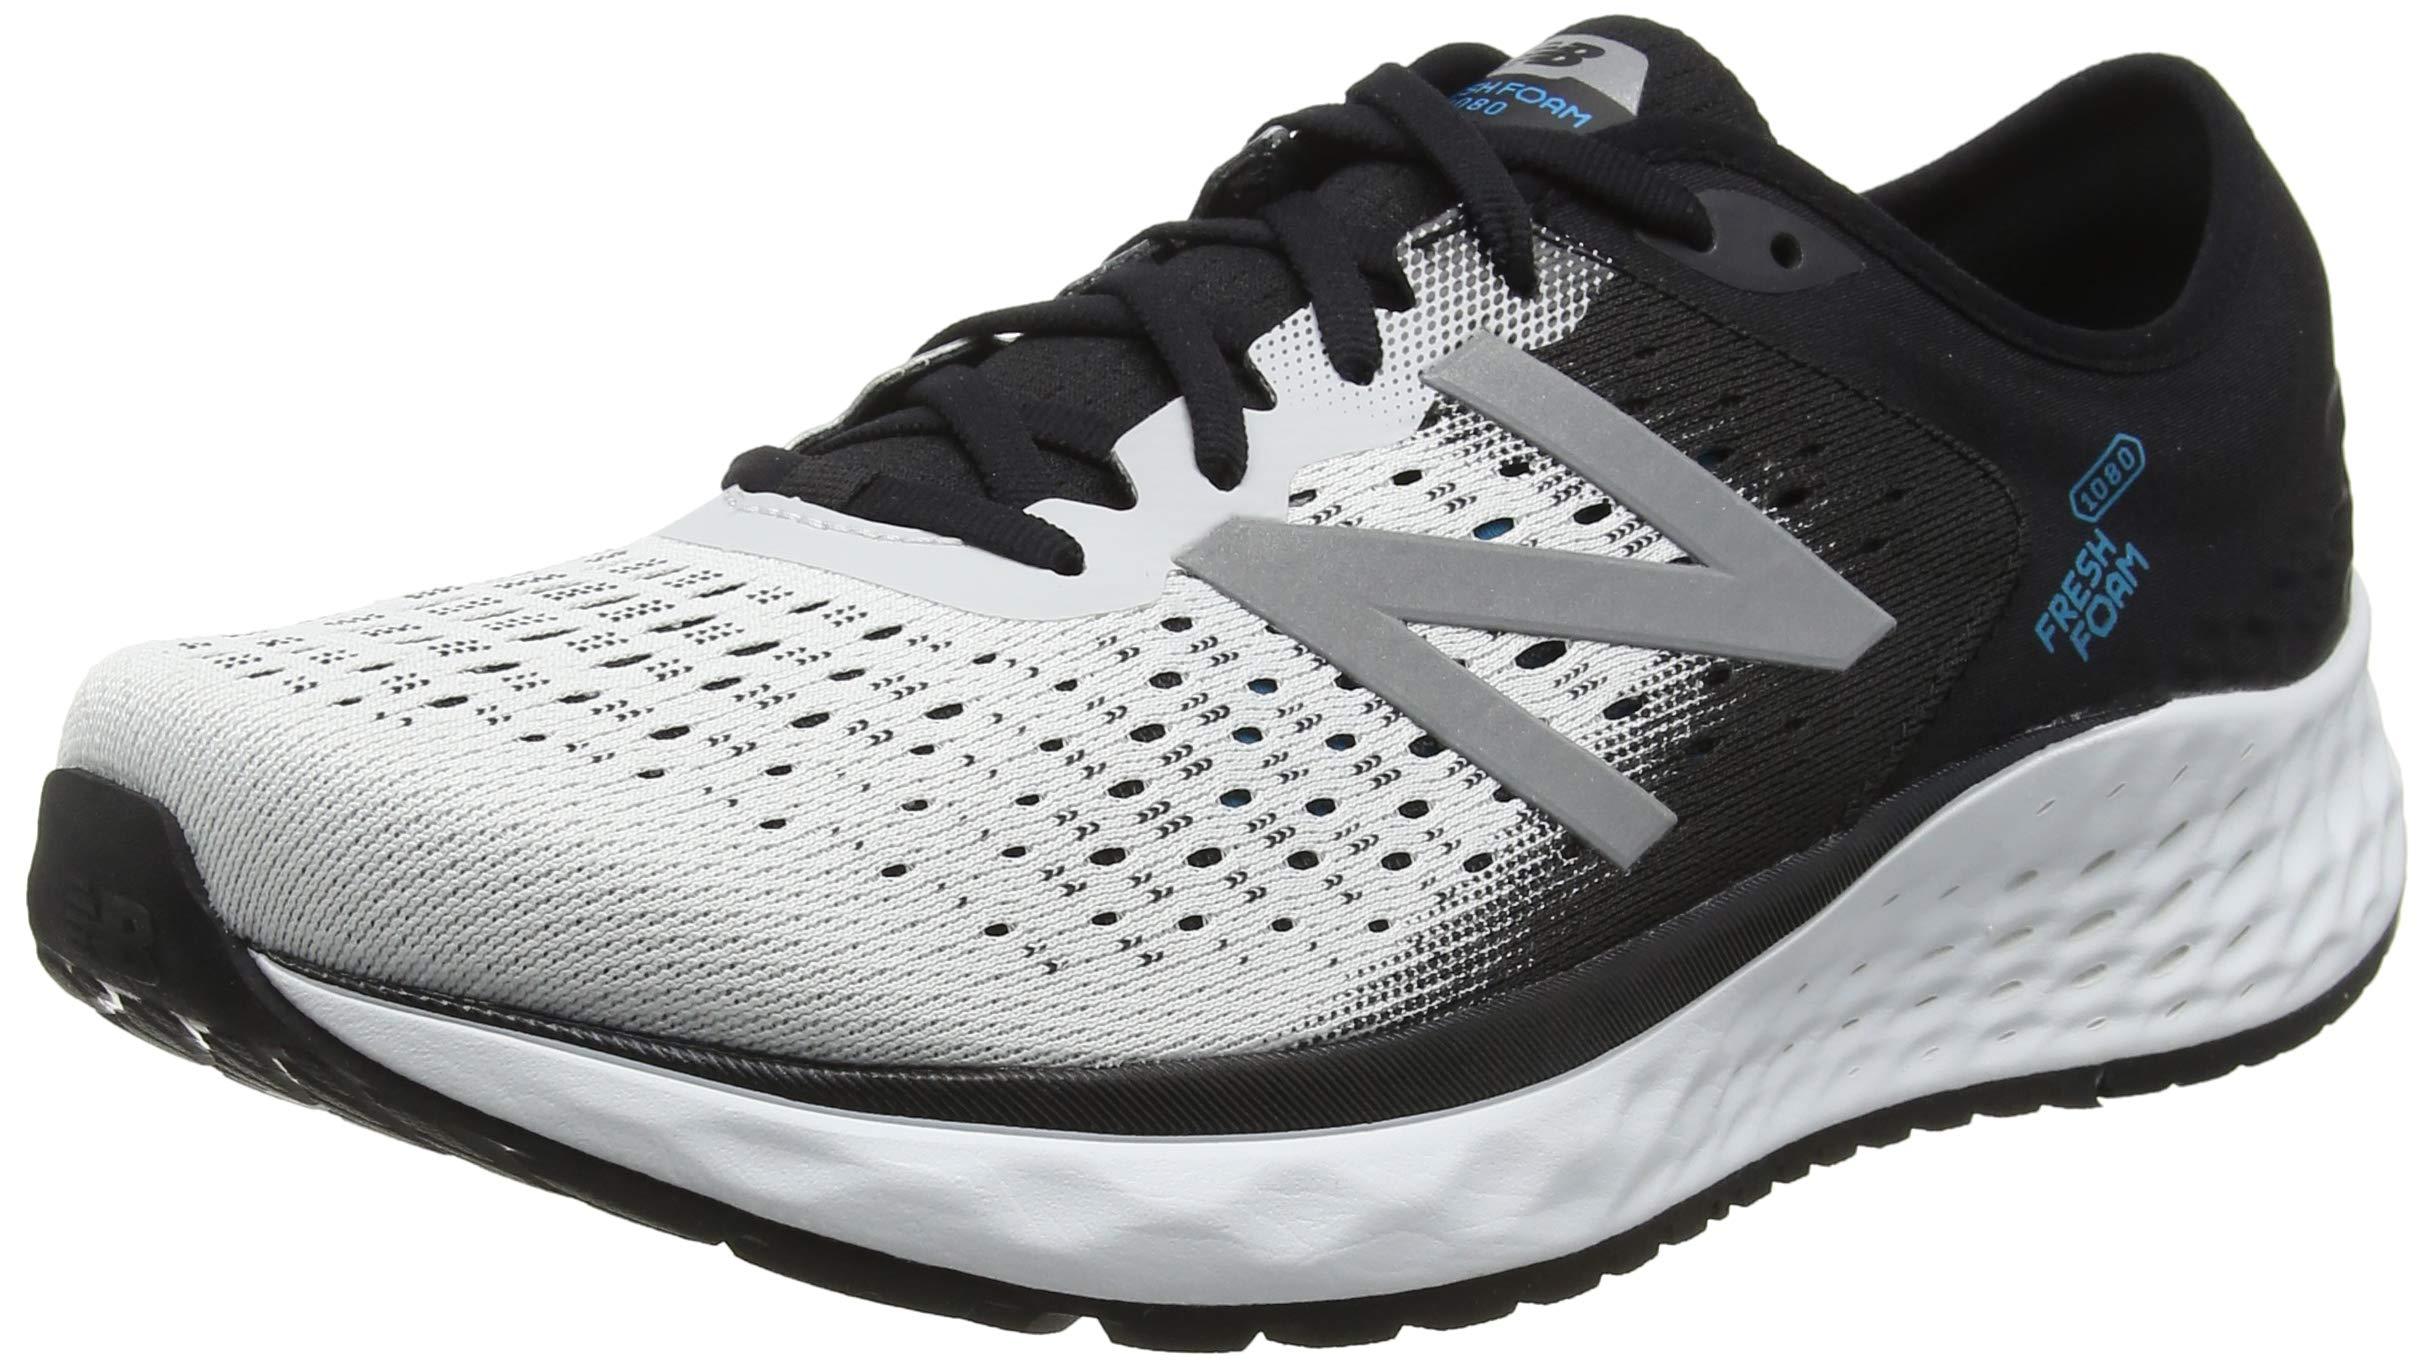 New Balance Men's 1080v9 Fresh Foam Running Shoe, White/Black/deep Ozone Blue, 7 D US by New Balance (Image #1)